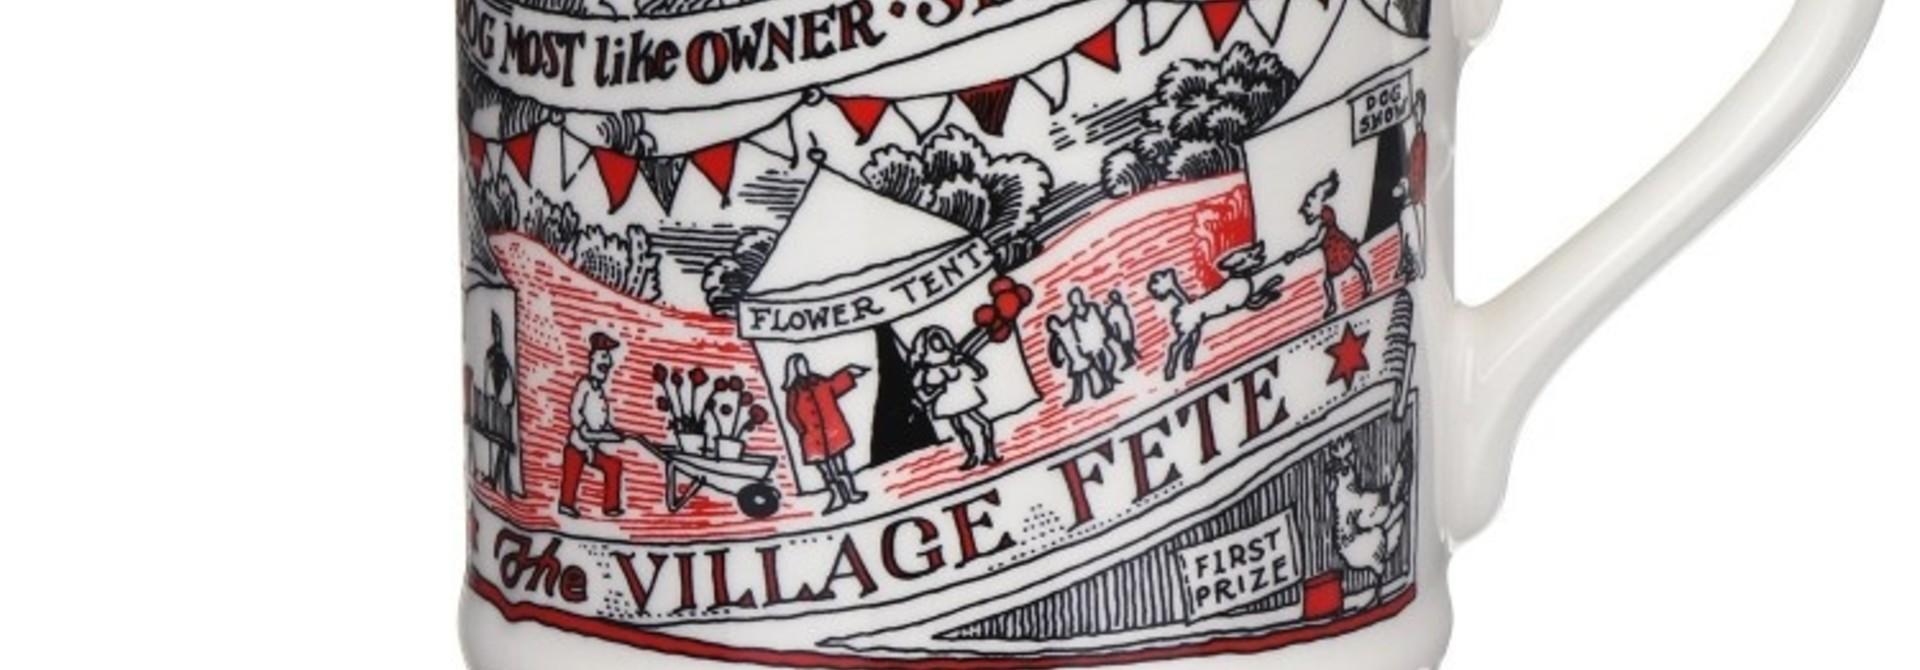 Village Fete - 1/2 Pint Mug